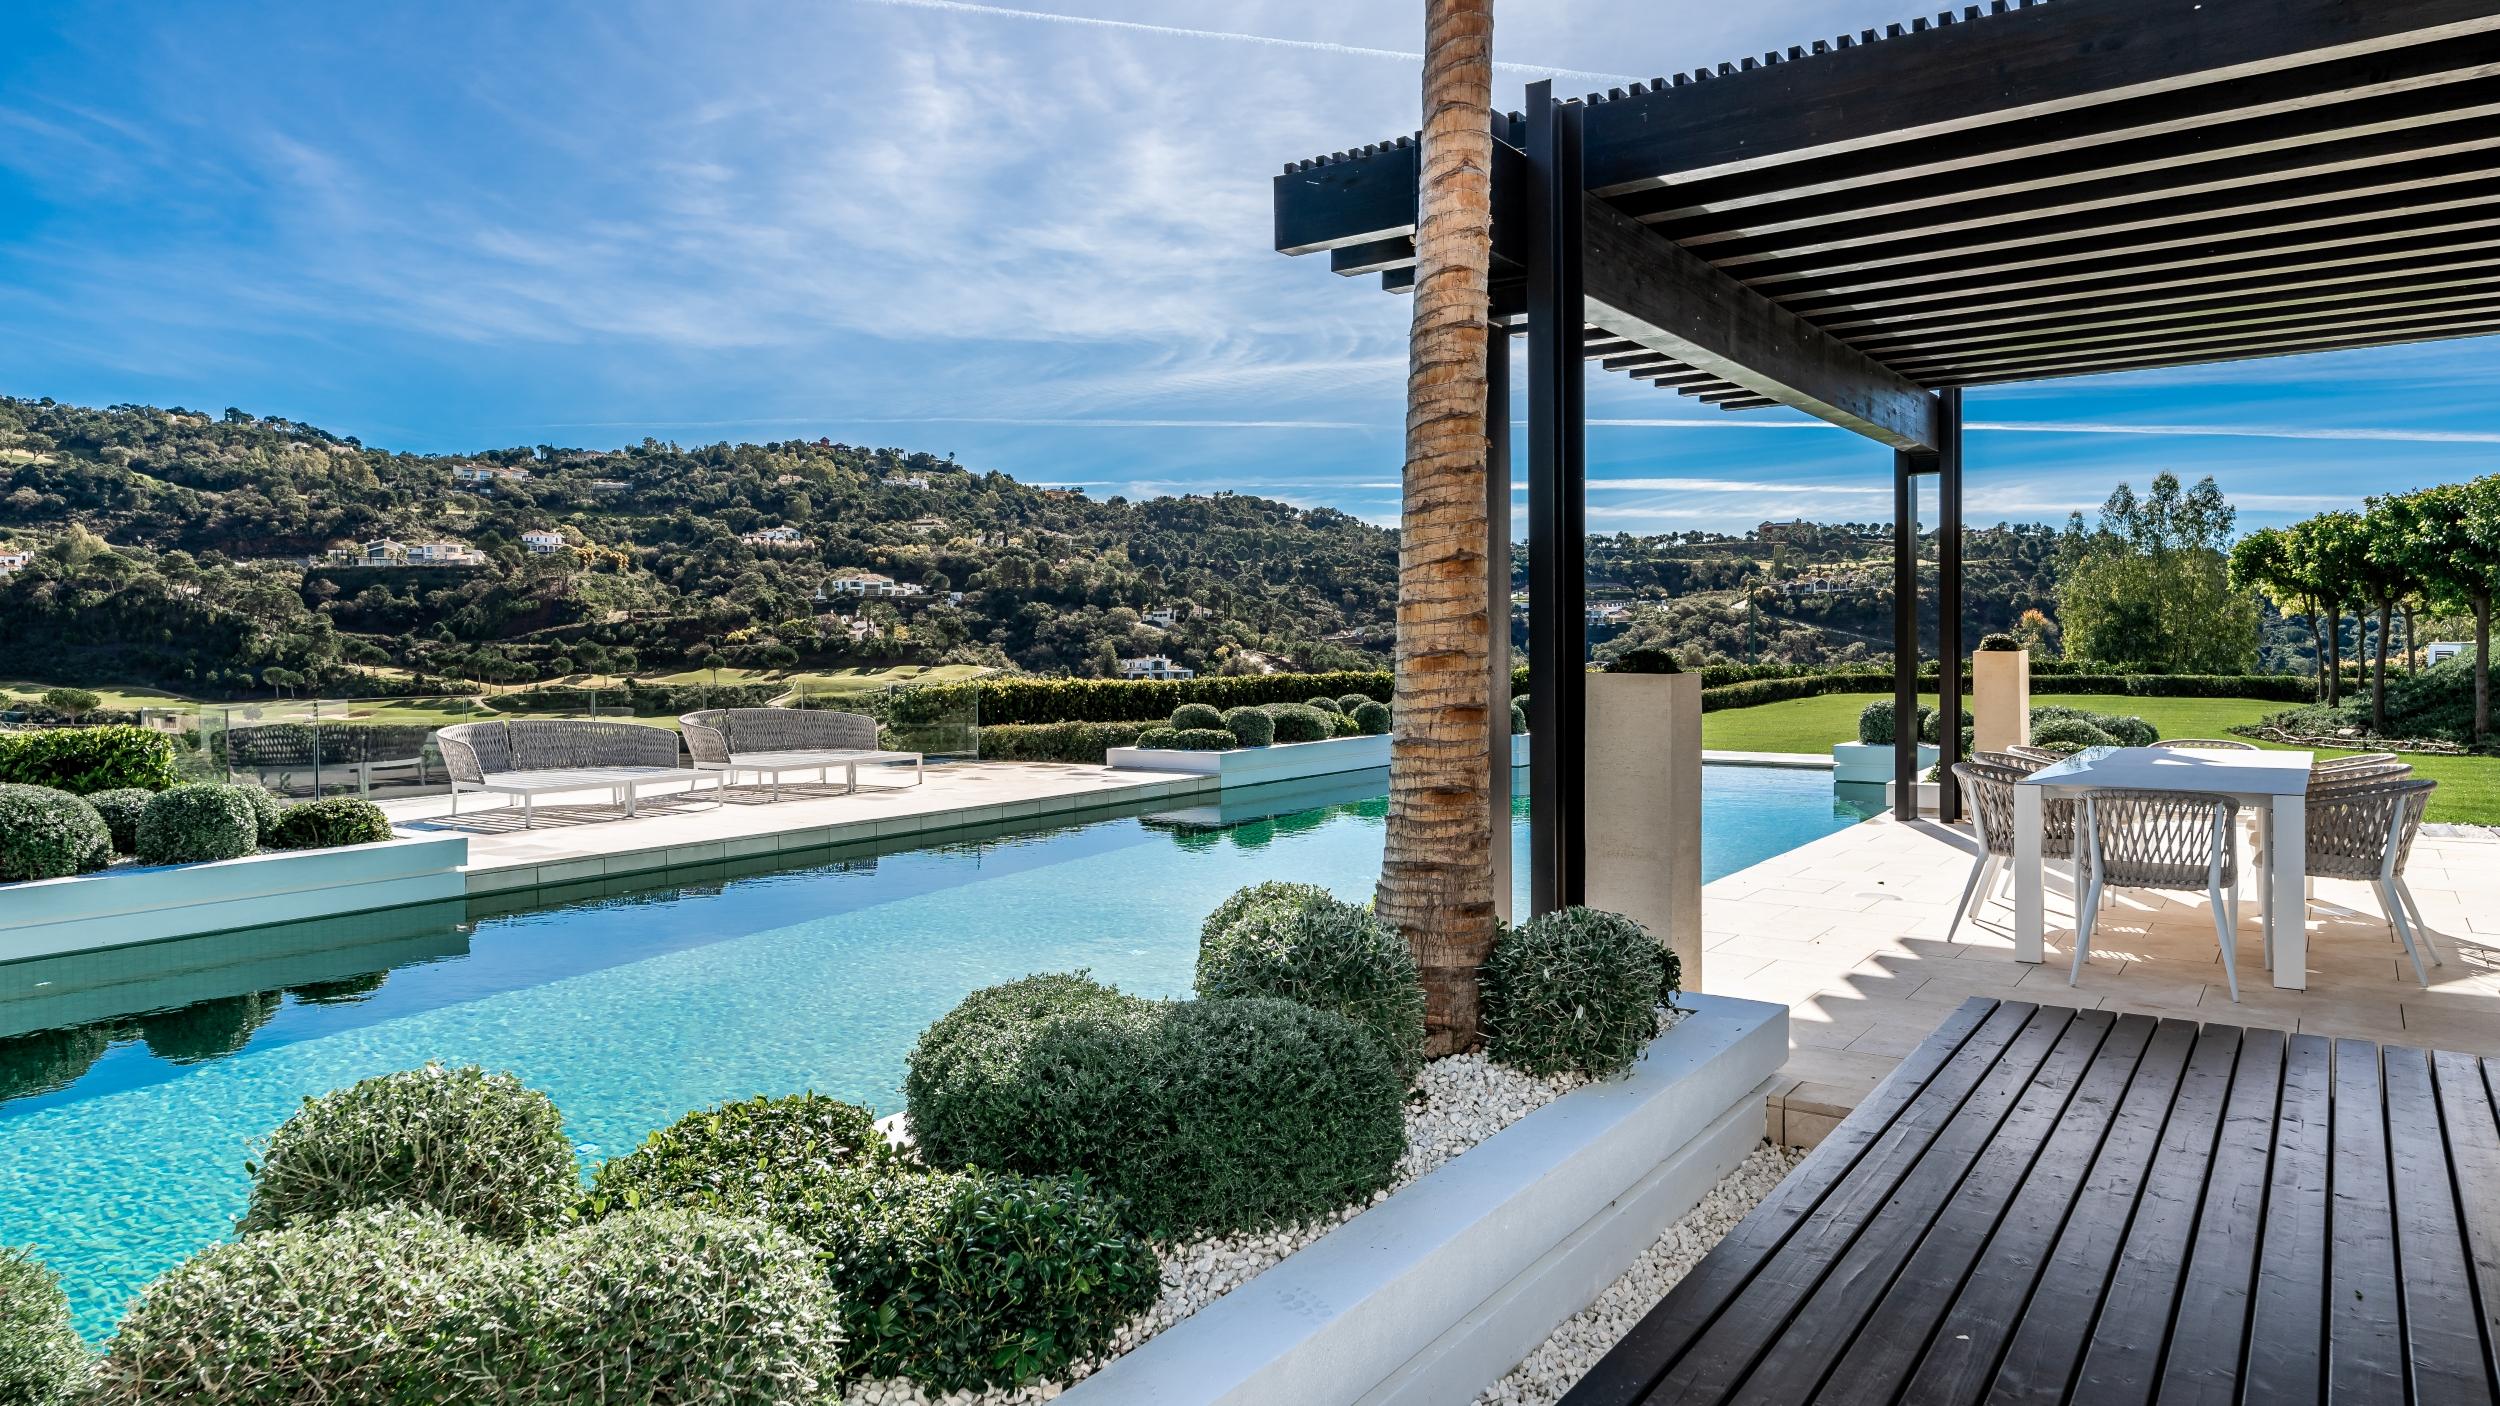 Luxury villa in La Zagaleta